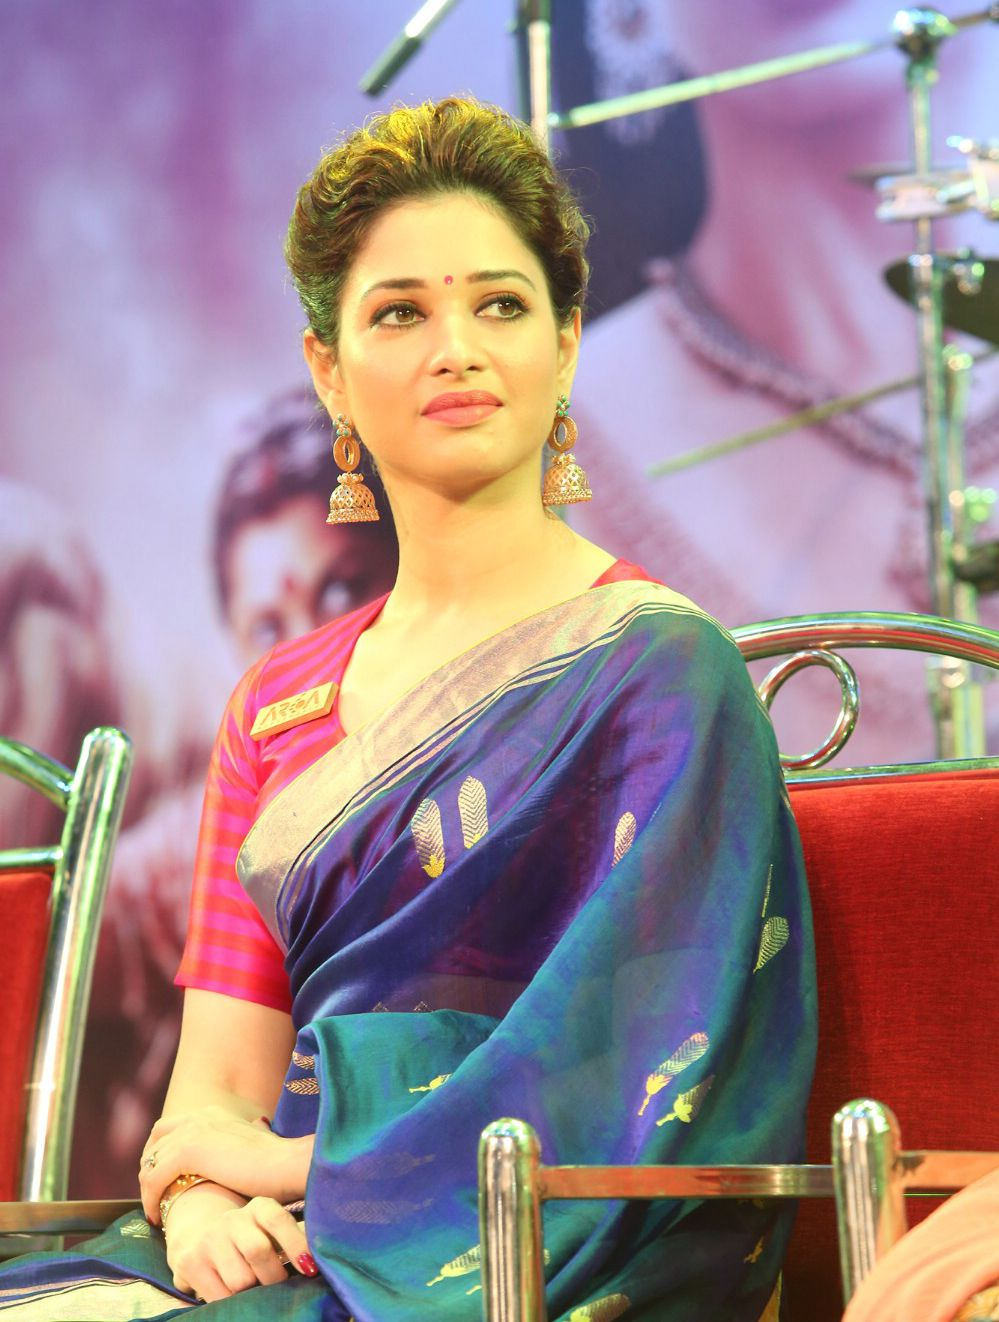 tamanna-bhatia-at-baahubali-malayalam-audio-launch-(1)863 | tamana